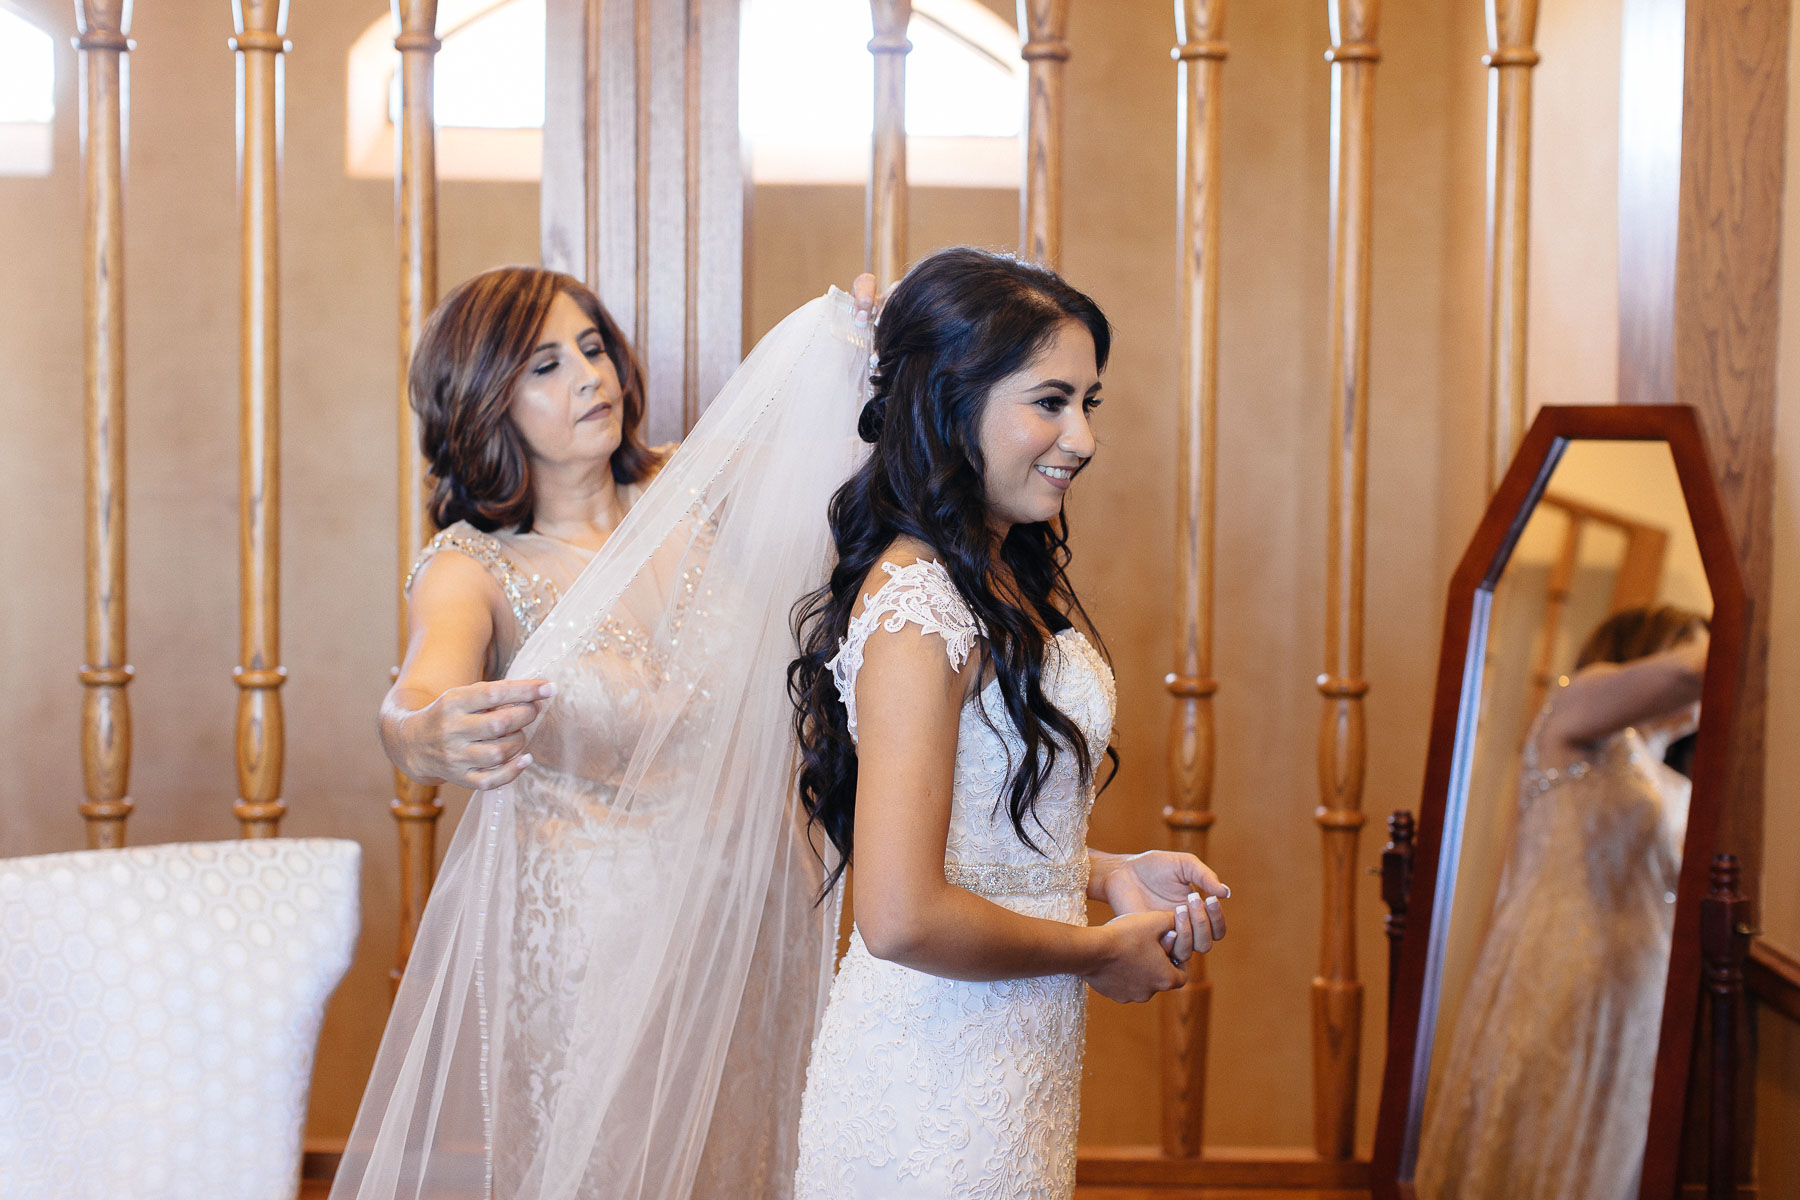 161029-Luxium-Weddings-Arizona-Jeff-Griselda-First-Look-Val-Vista-Lakes-Gilber-026.jpg